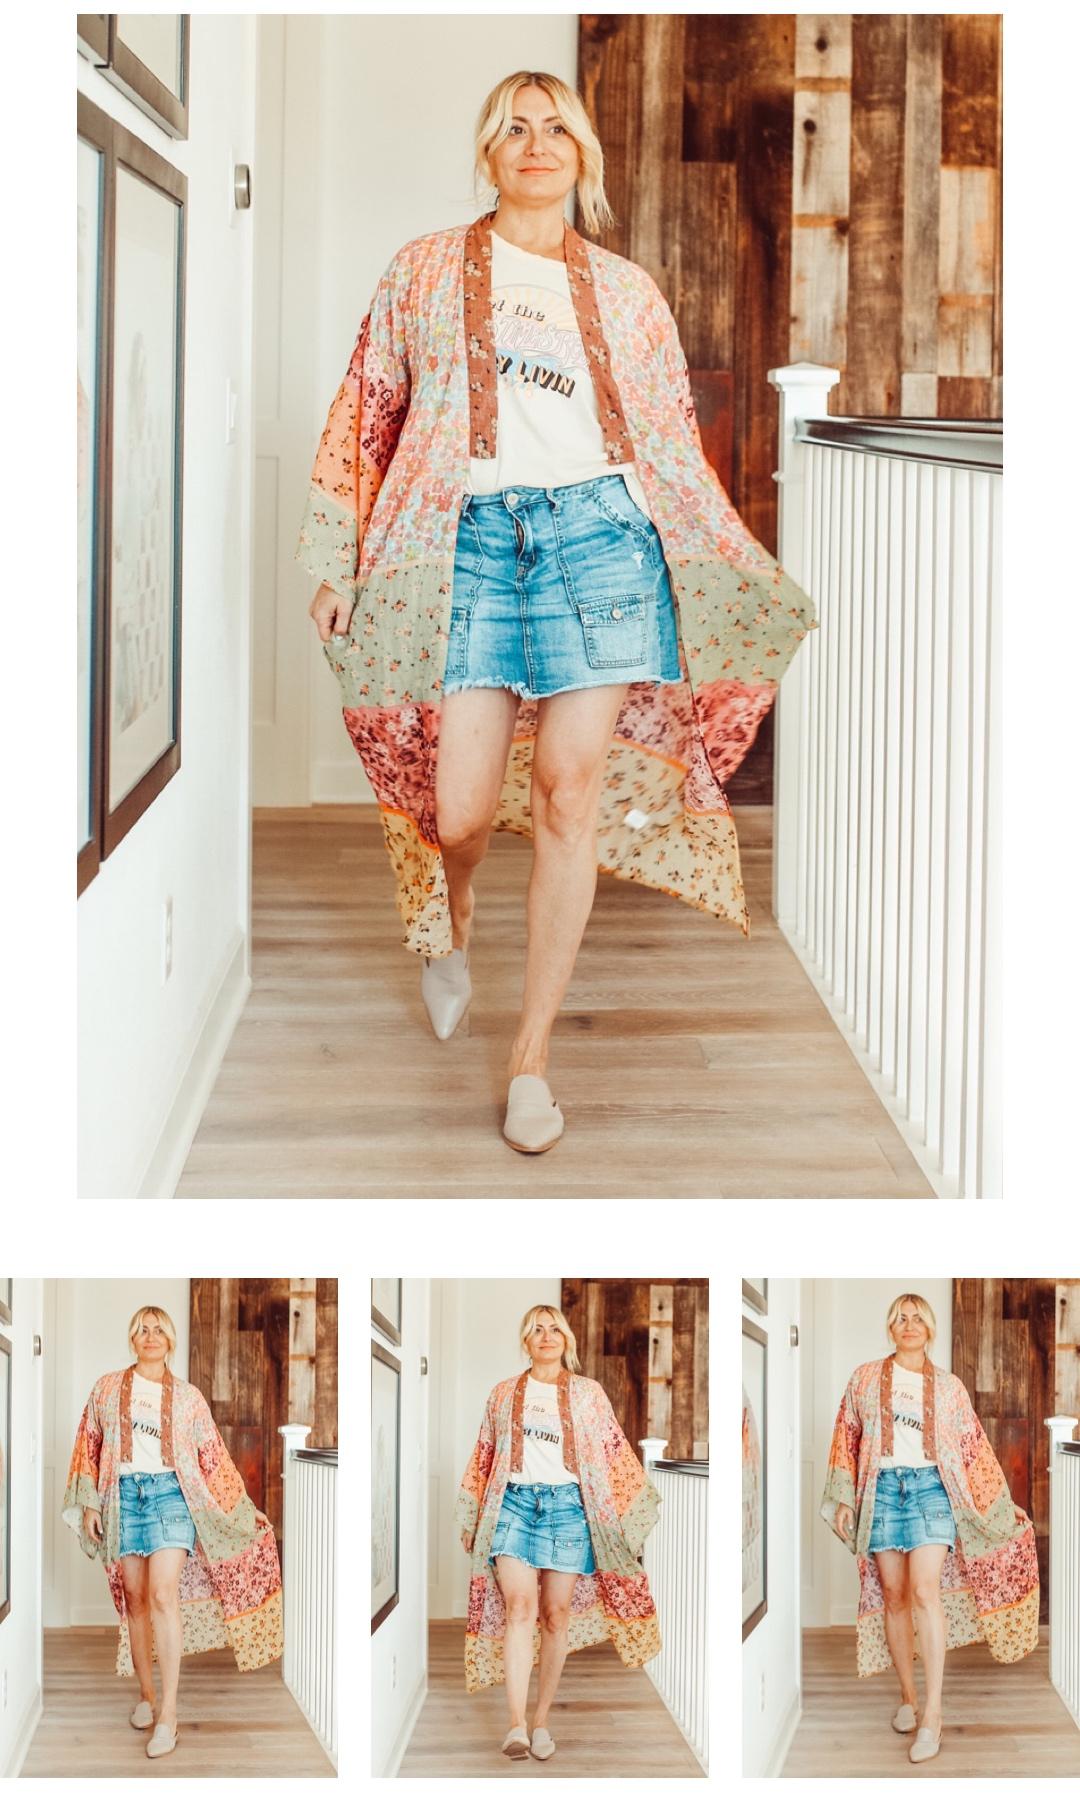 fashion outfit details